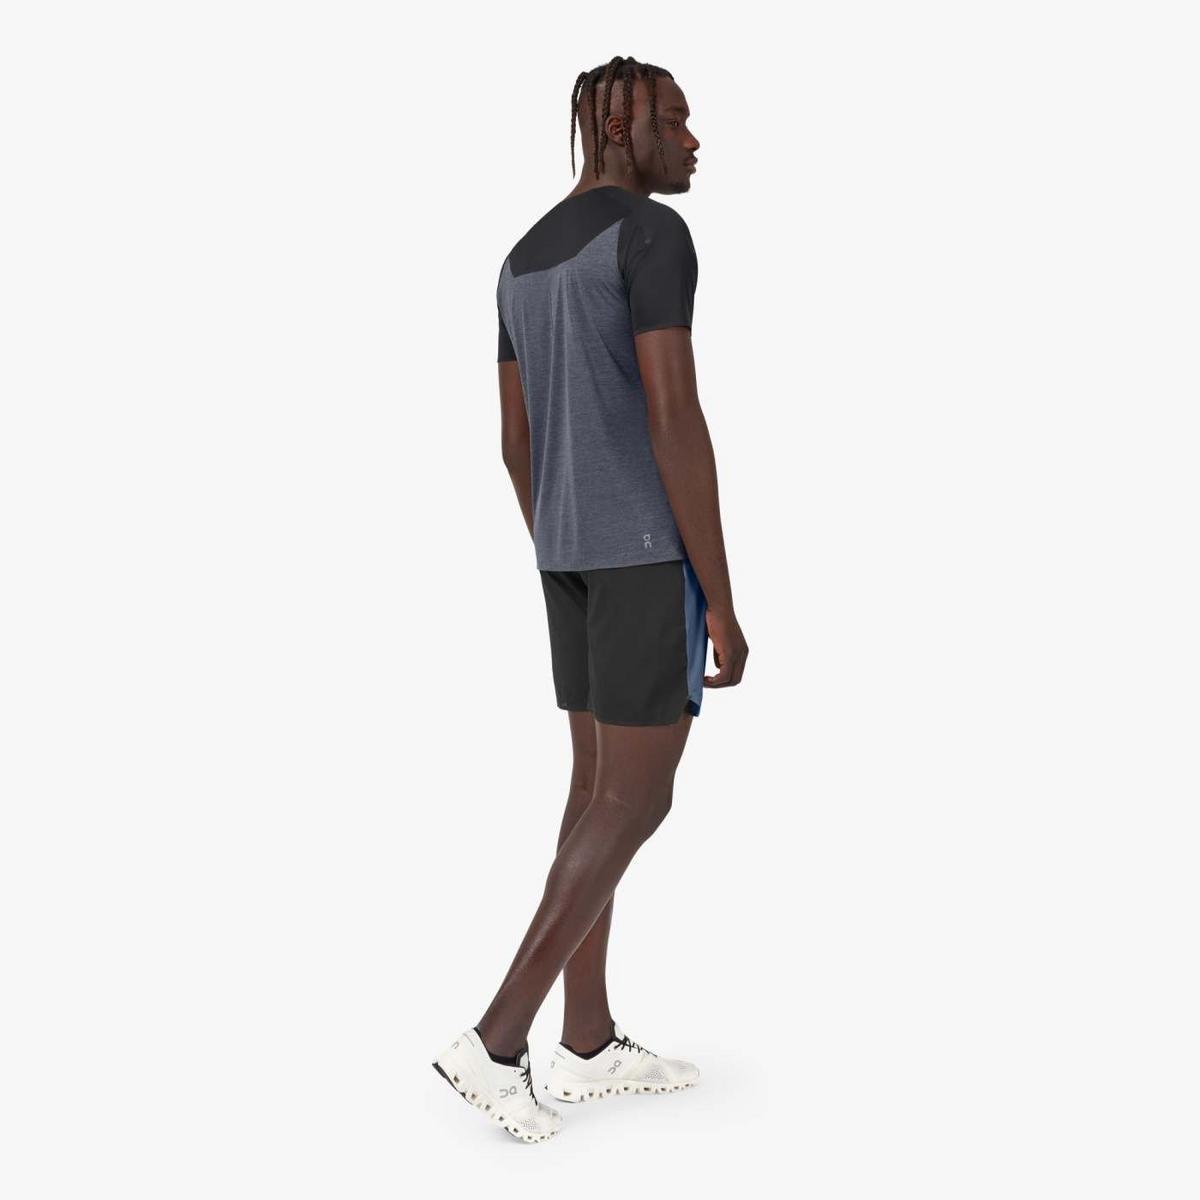 On Men's Performance Tee - Black